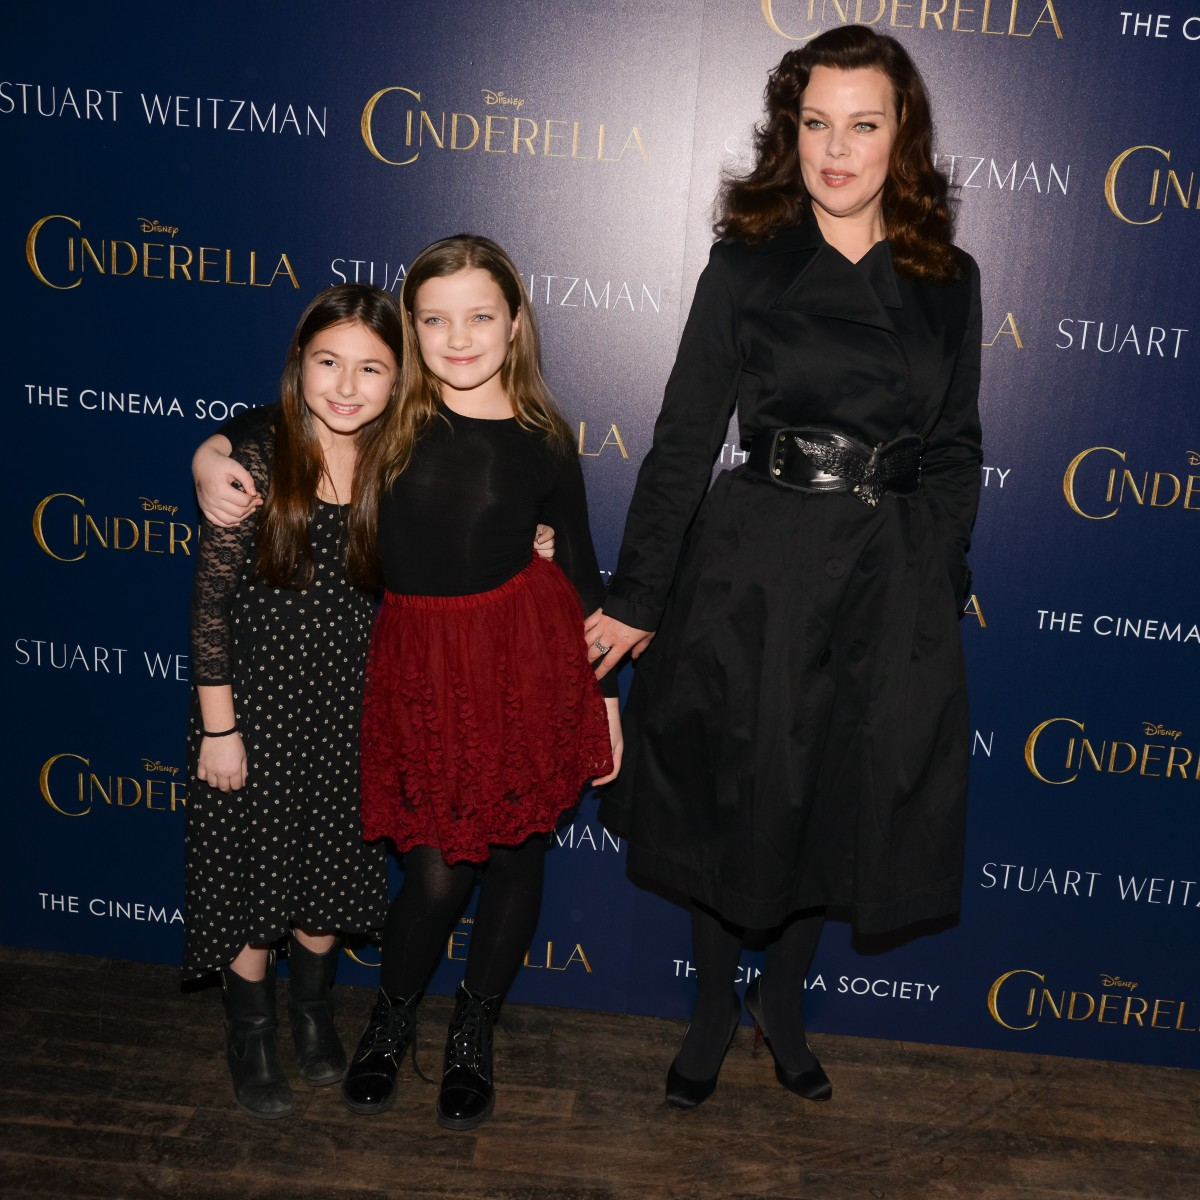 THE CINEMA SOCIETY & STUART WEITZMAN host a special screening of Disney's Cinderella